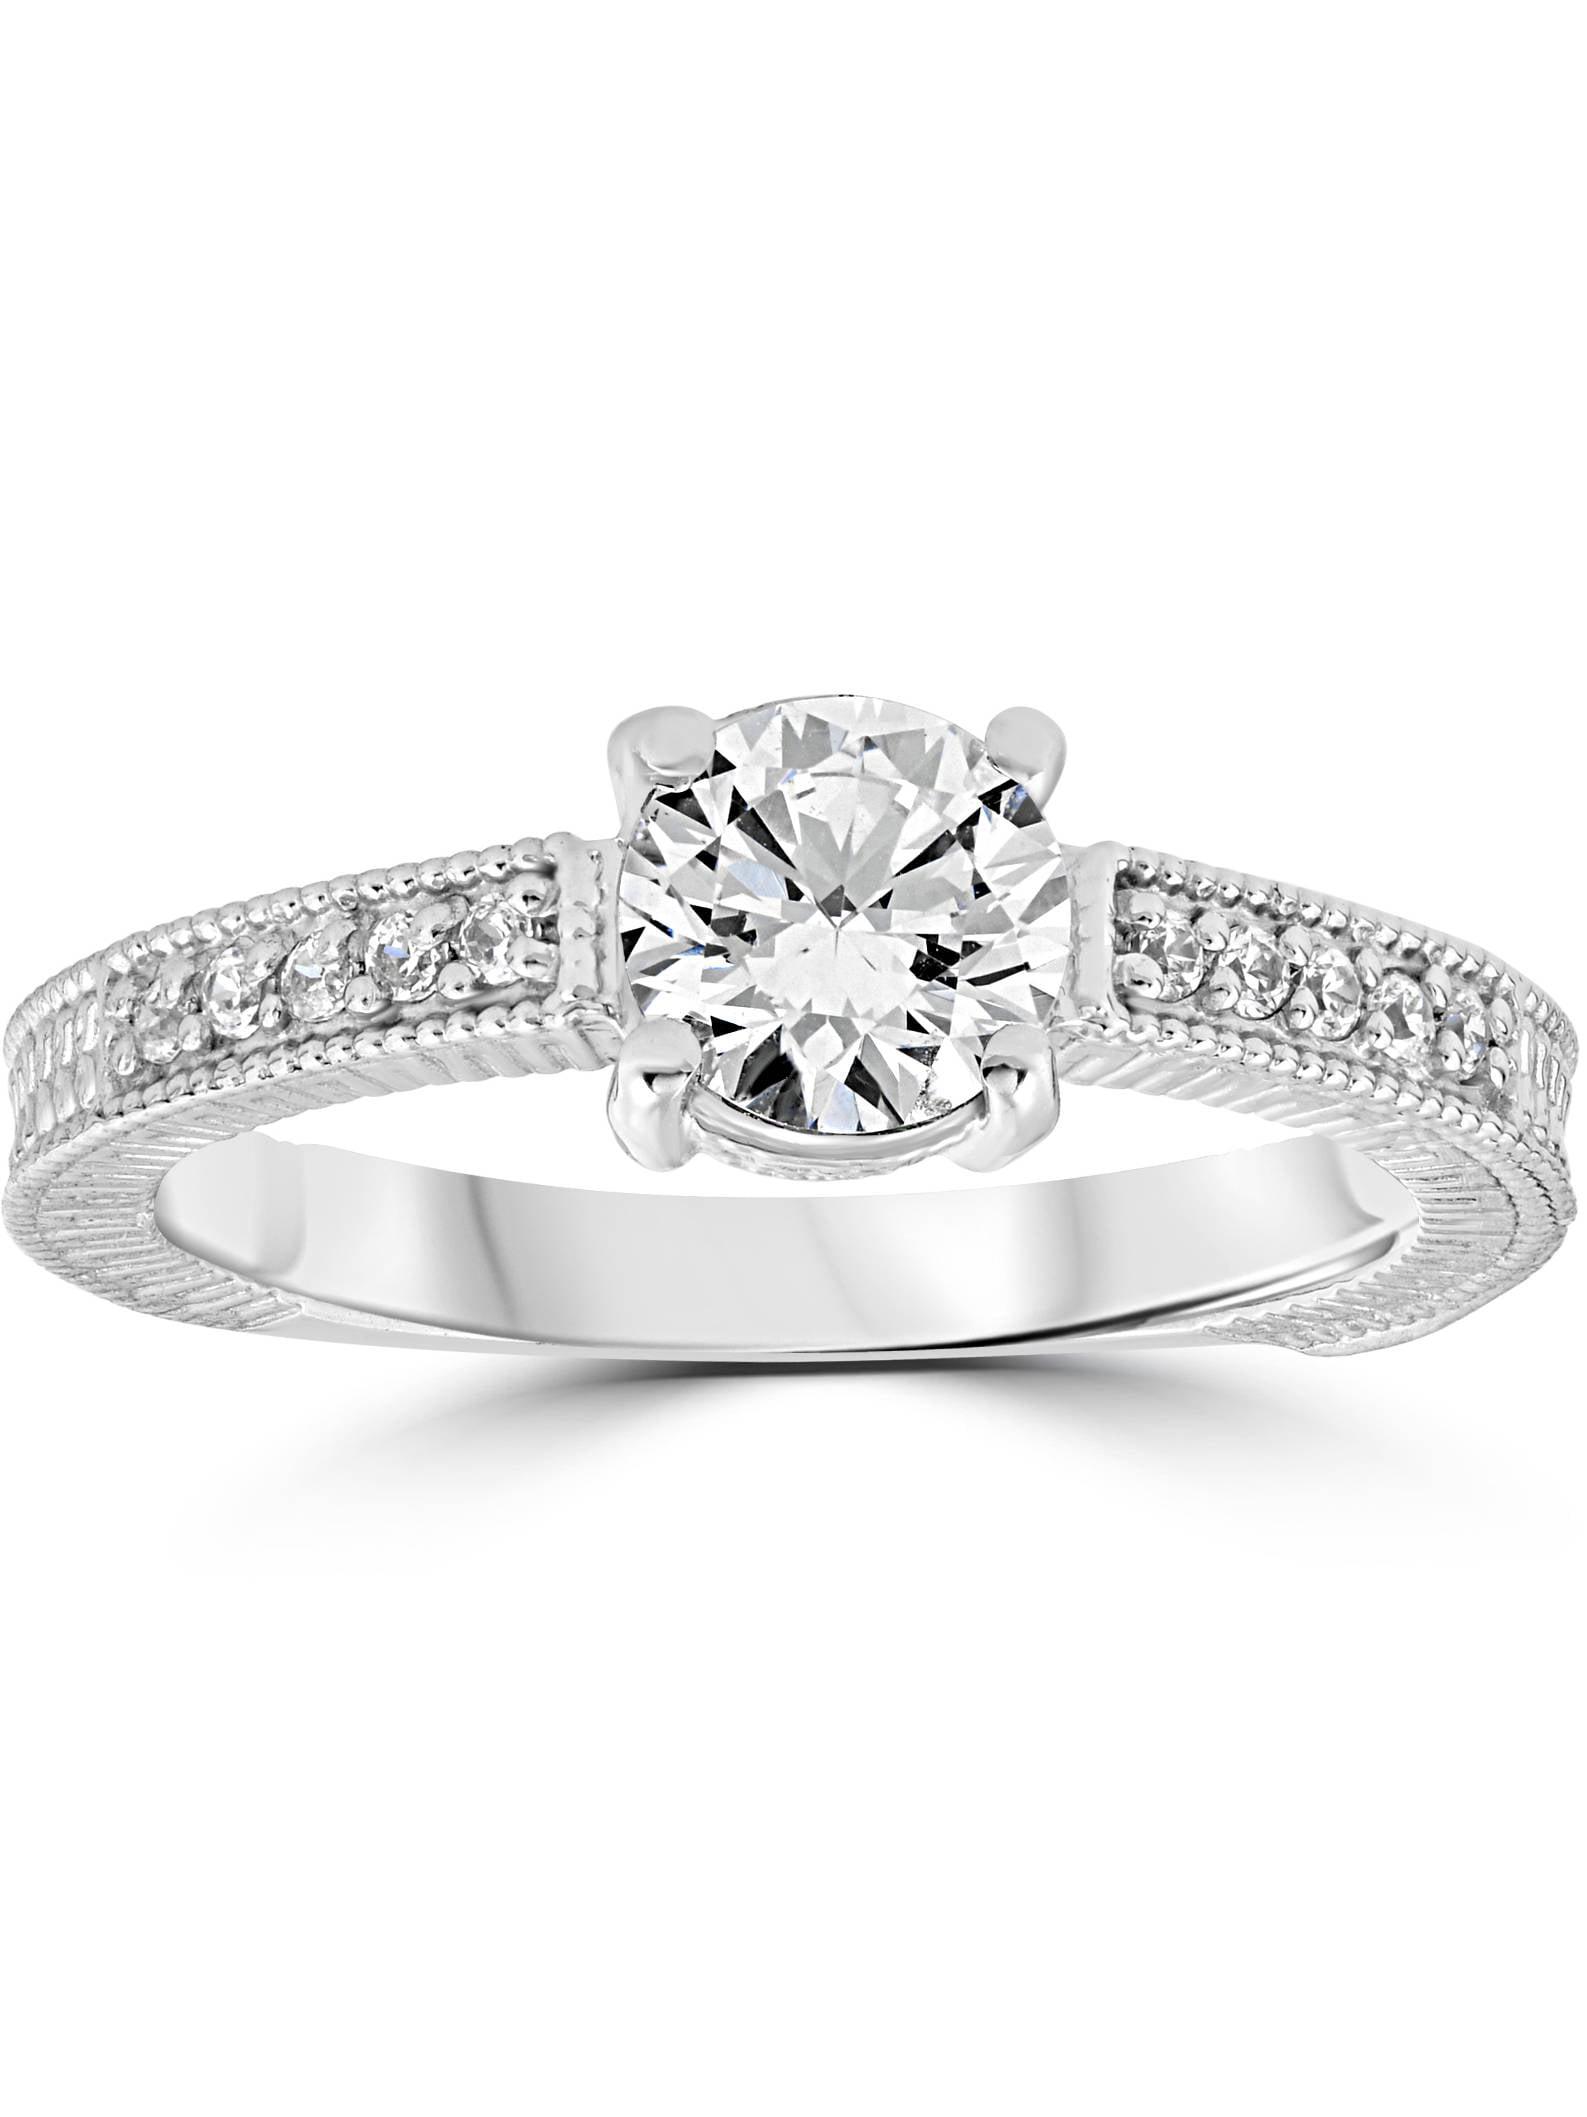 Vintage Diamond Engagement Ring 1 Carat 14K White Gold Round Brilliant Cut by Pompeii3